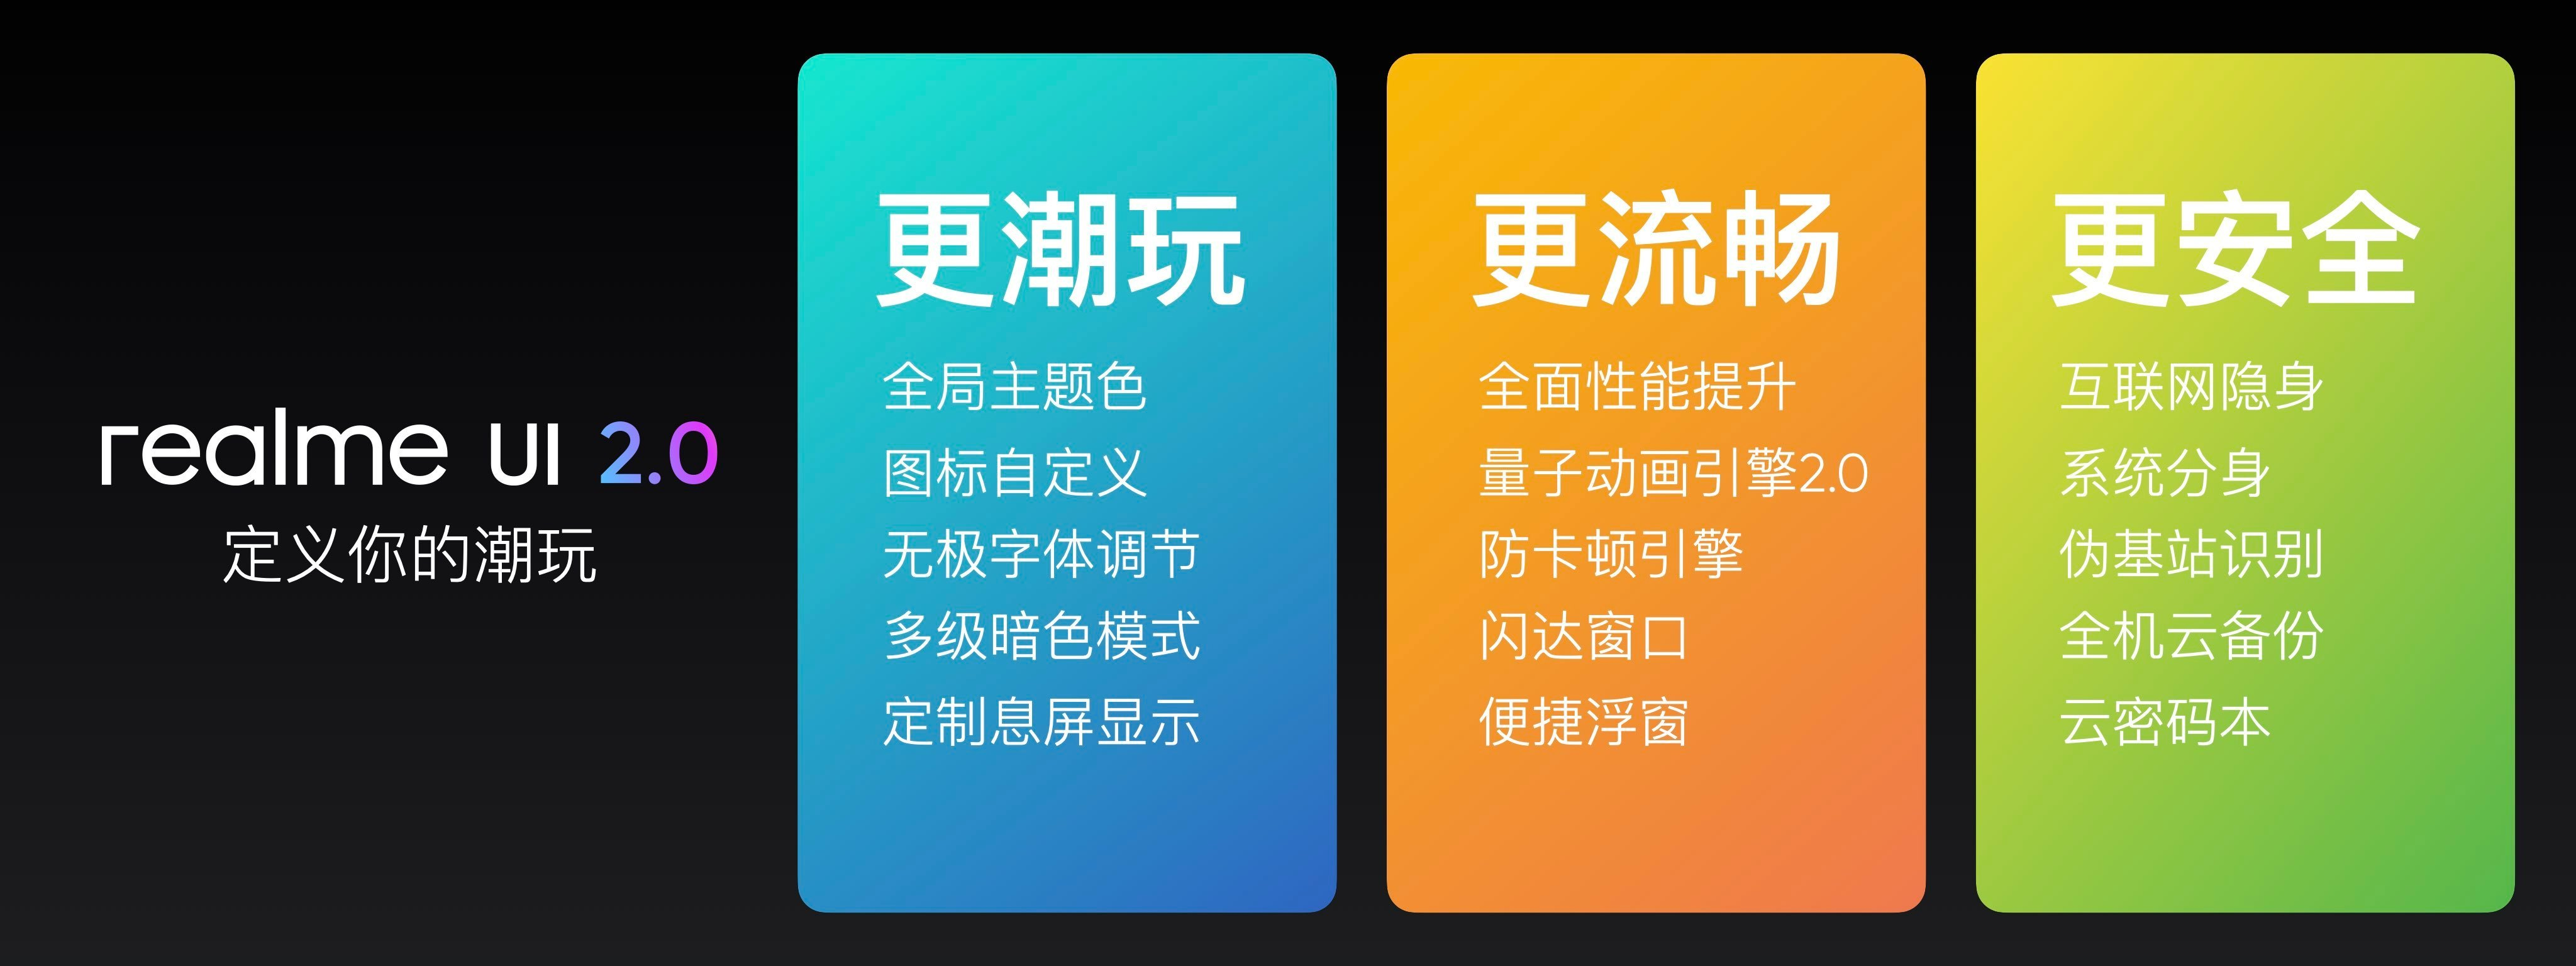 Realme UI2.0正式发布,UI,隐私全面升级